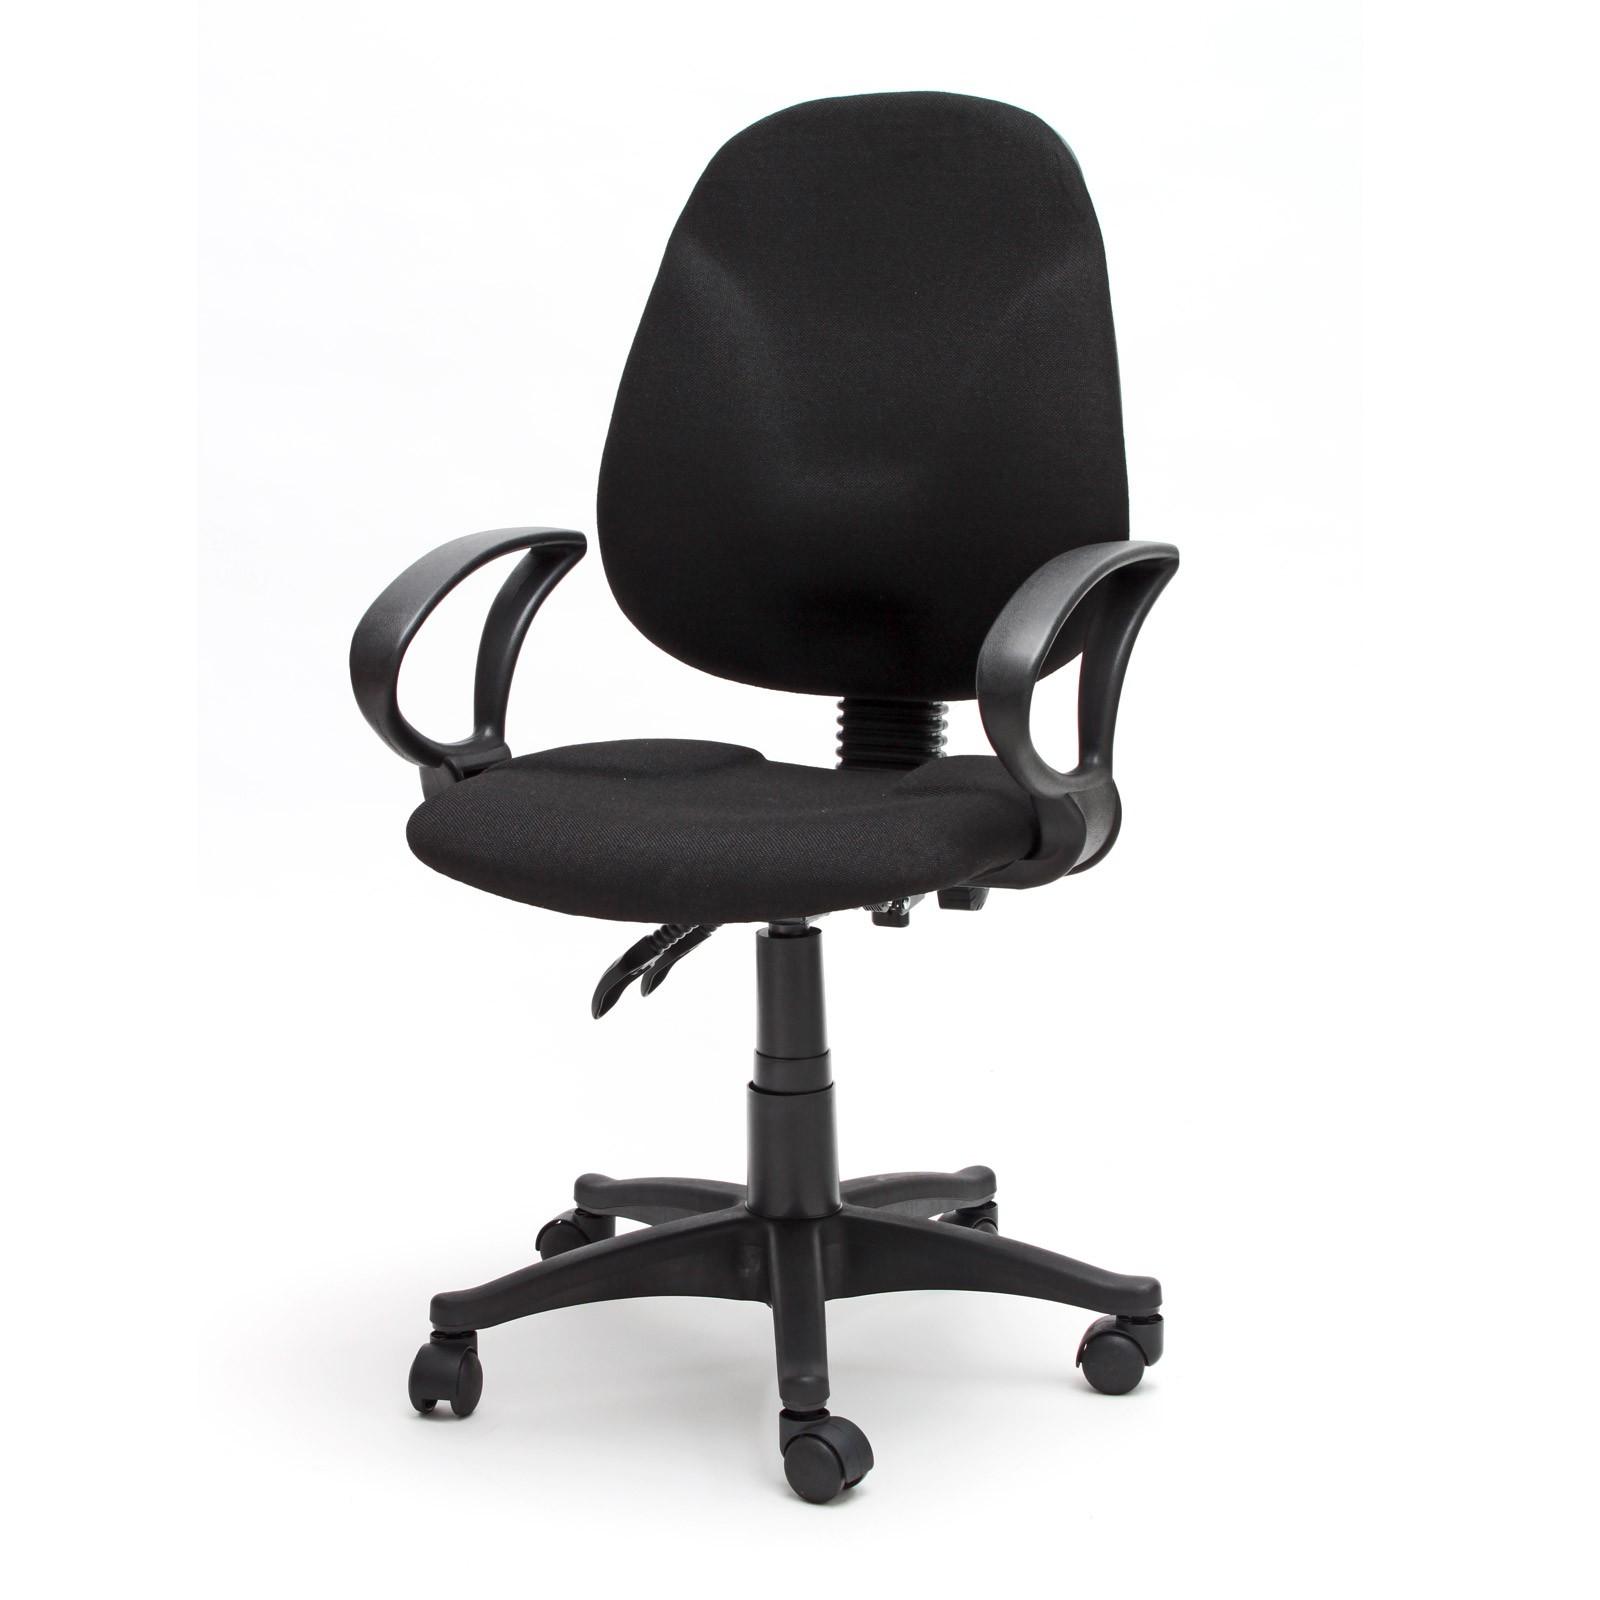 drehstuhl b ro b rostuhl stuhl bern schreibtisch stoffbezug schwarz ebay. Black Bedroom Furniture Sets. Home Design Ideas